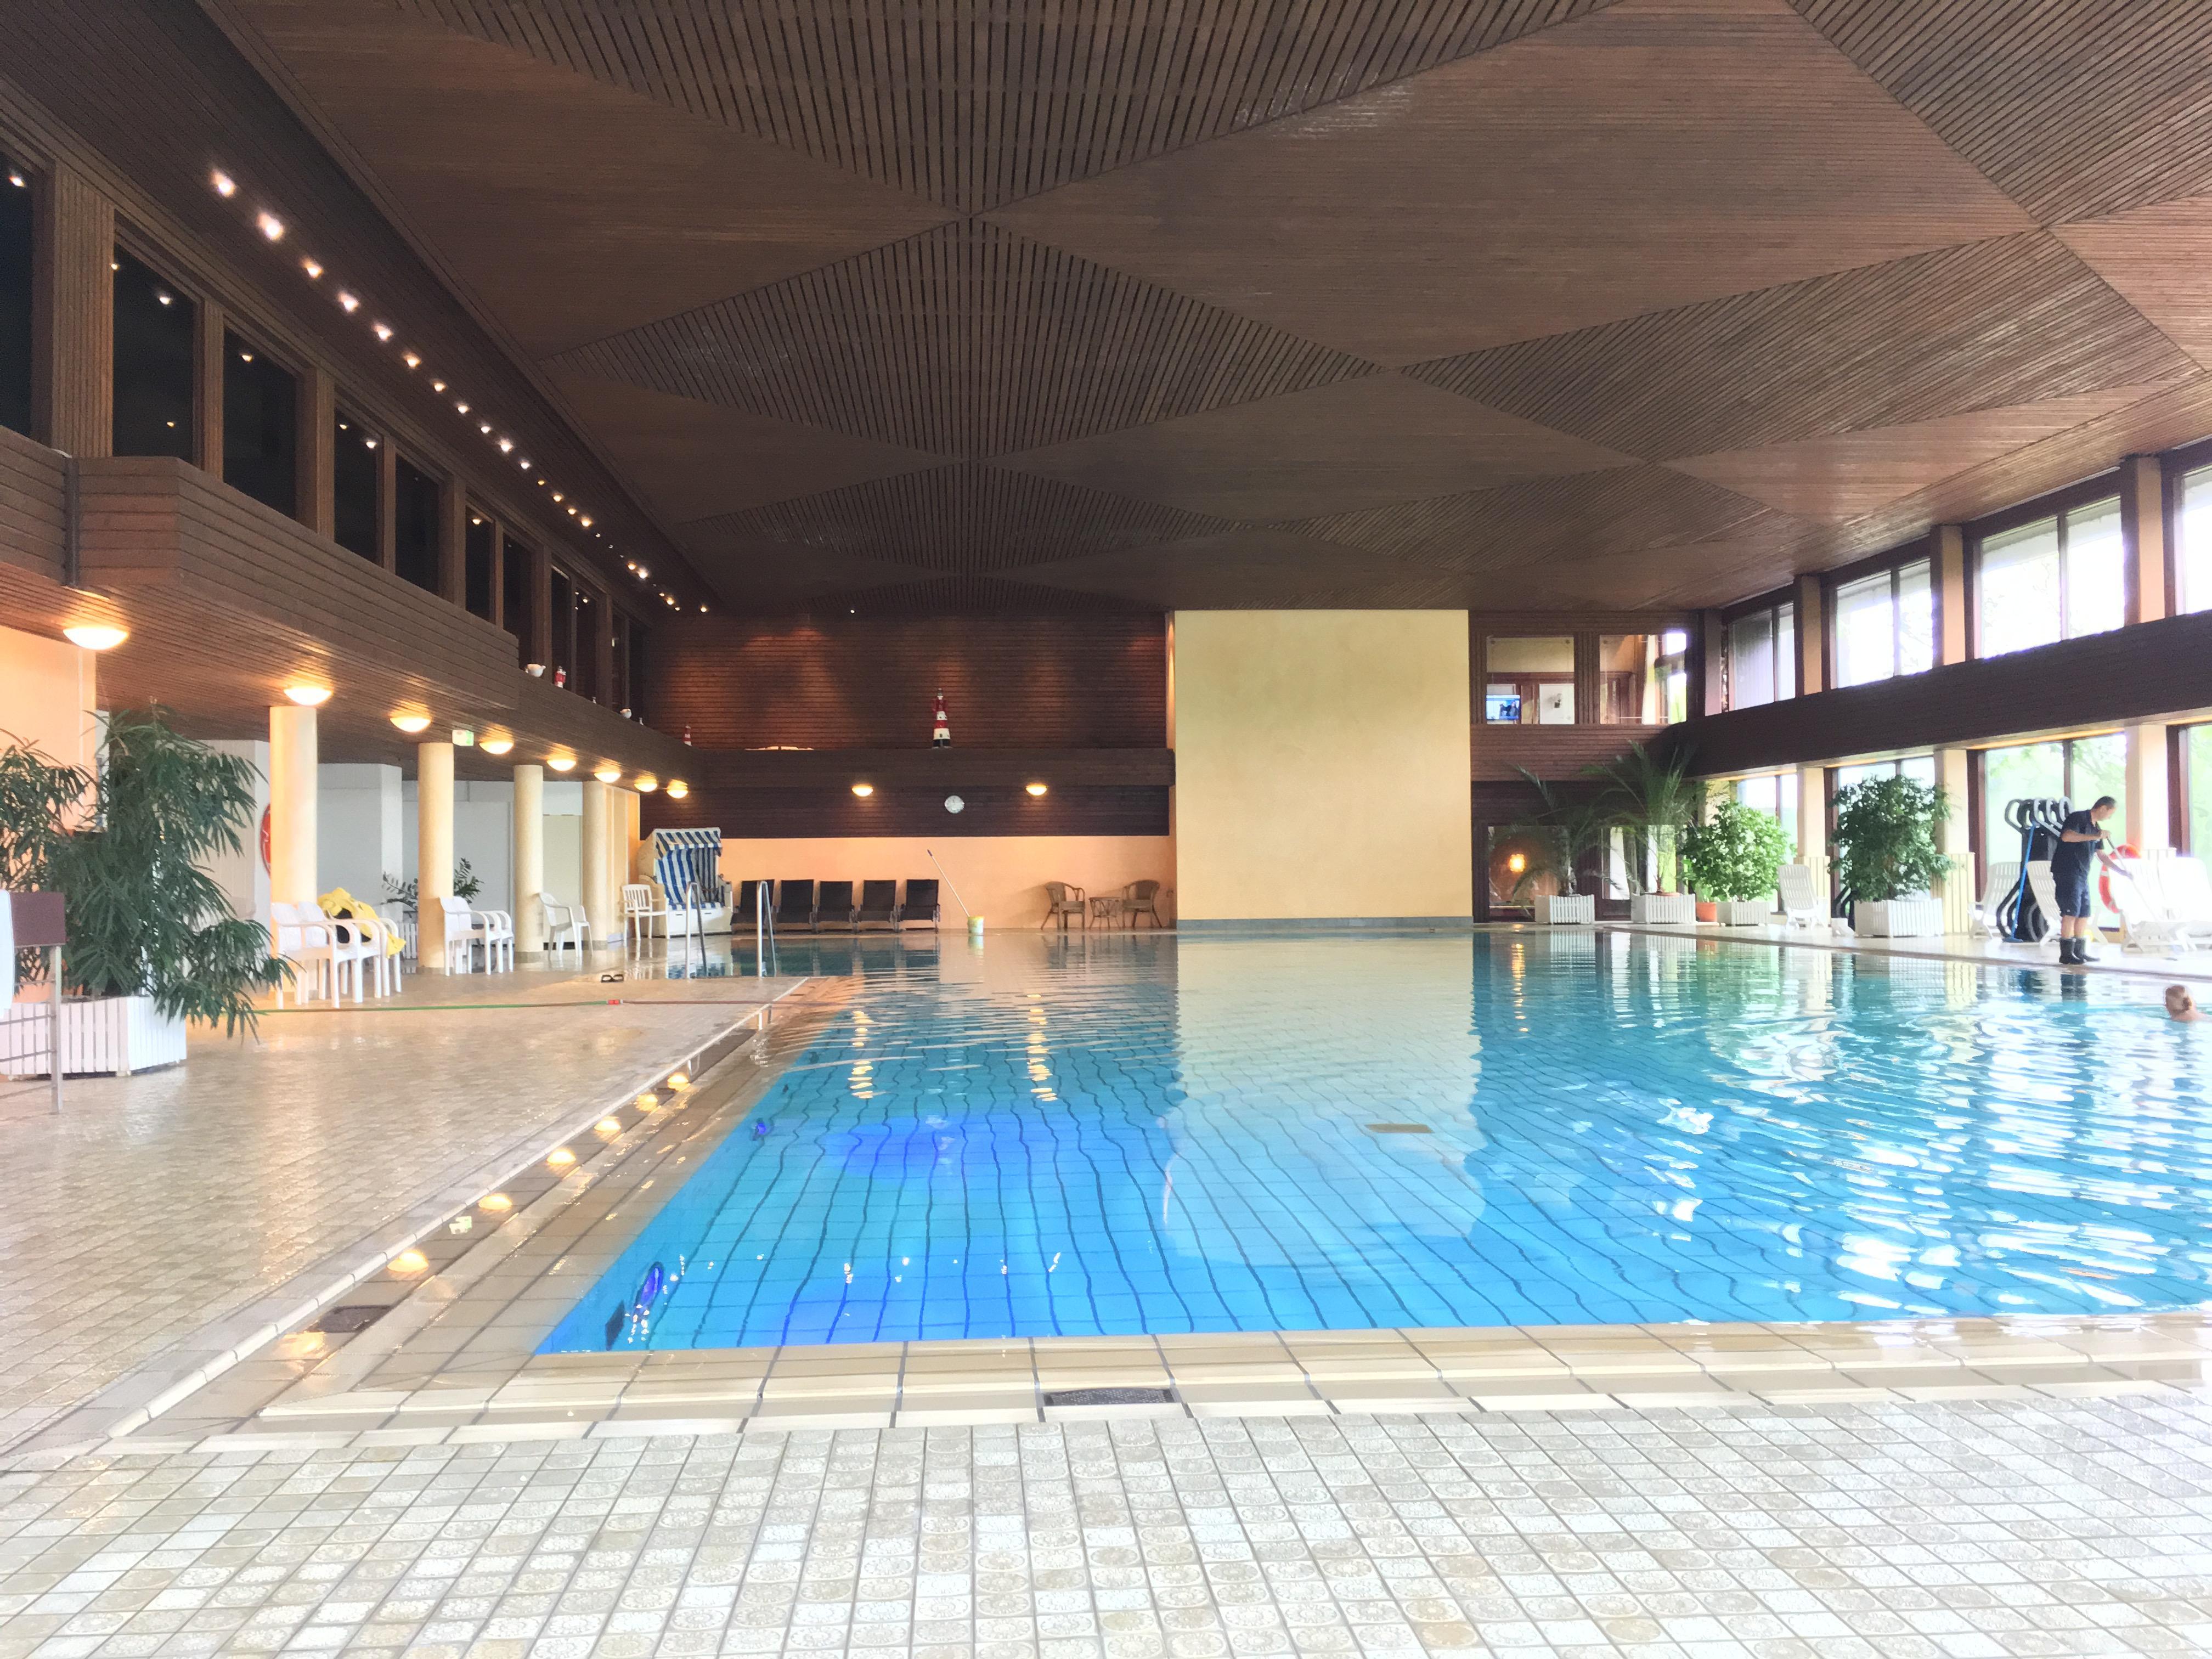 Sauberes Schwimmbad